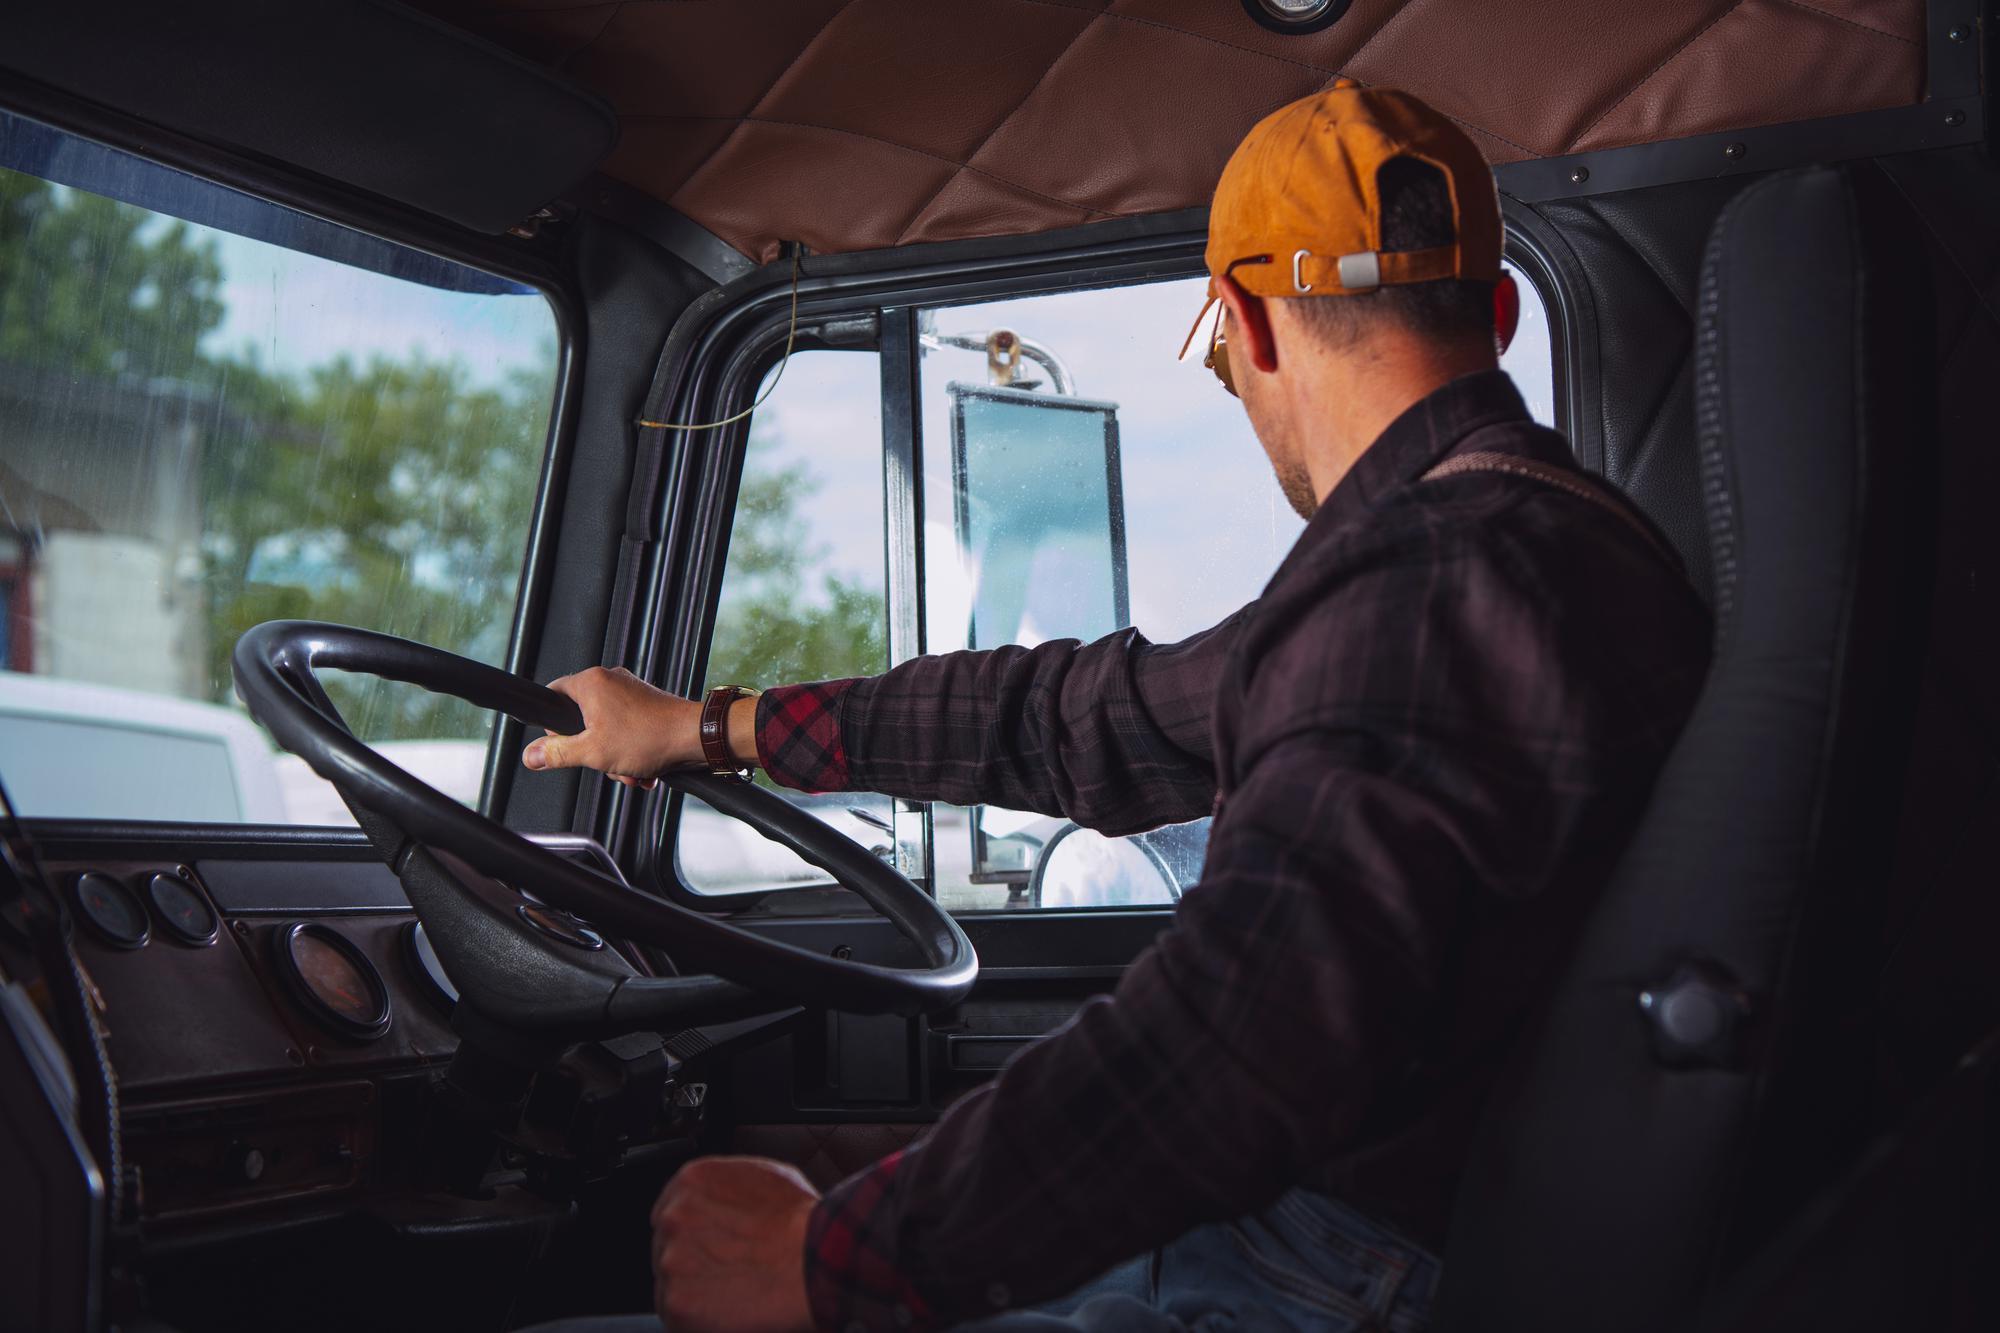 134465427-trucker-his-40s-inside-vintage